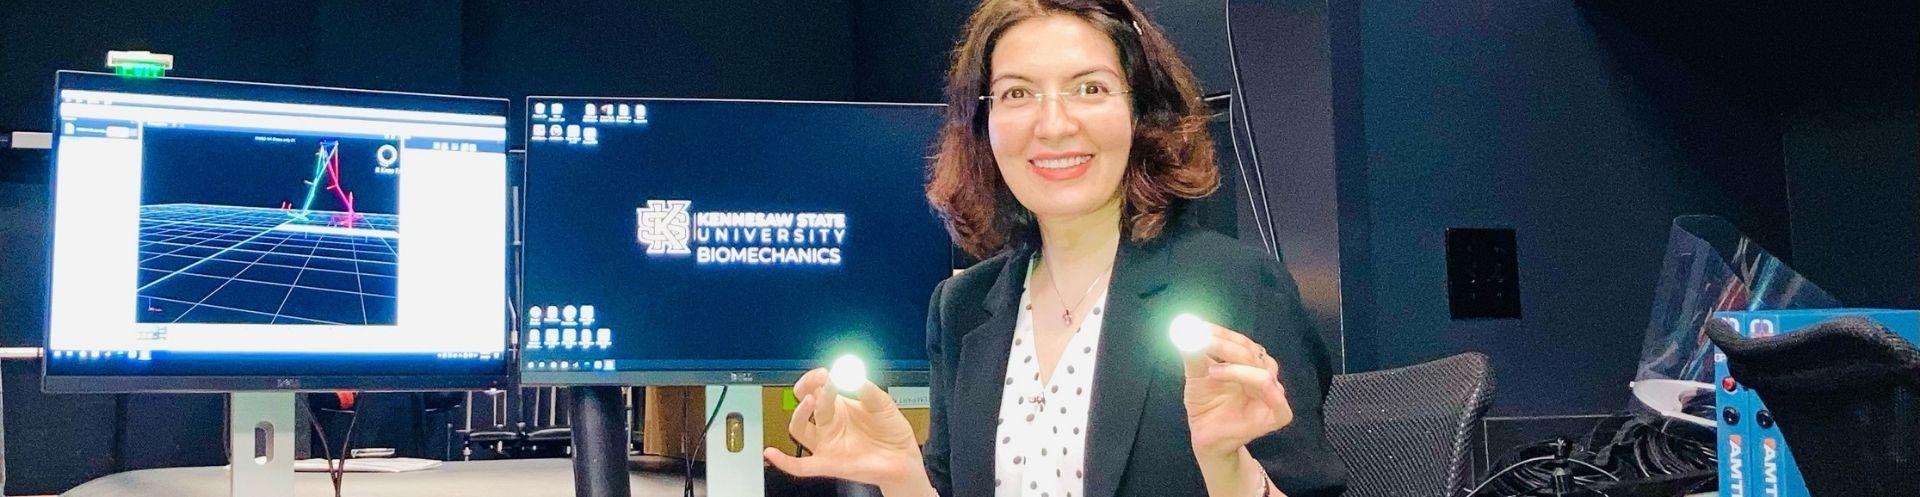 Postdoctoral researcher brings clinical experience to KSU's Biomechanics Lab